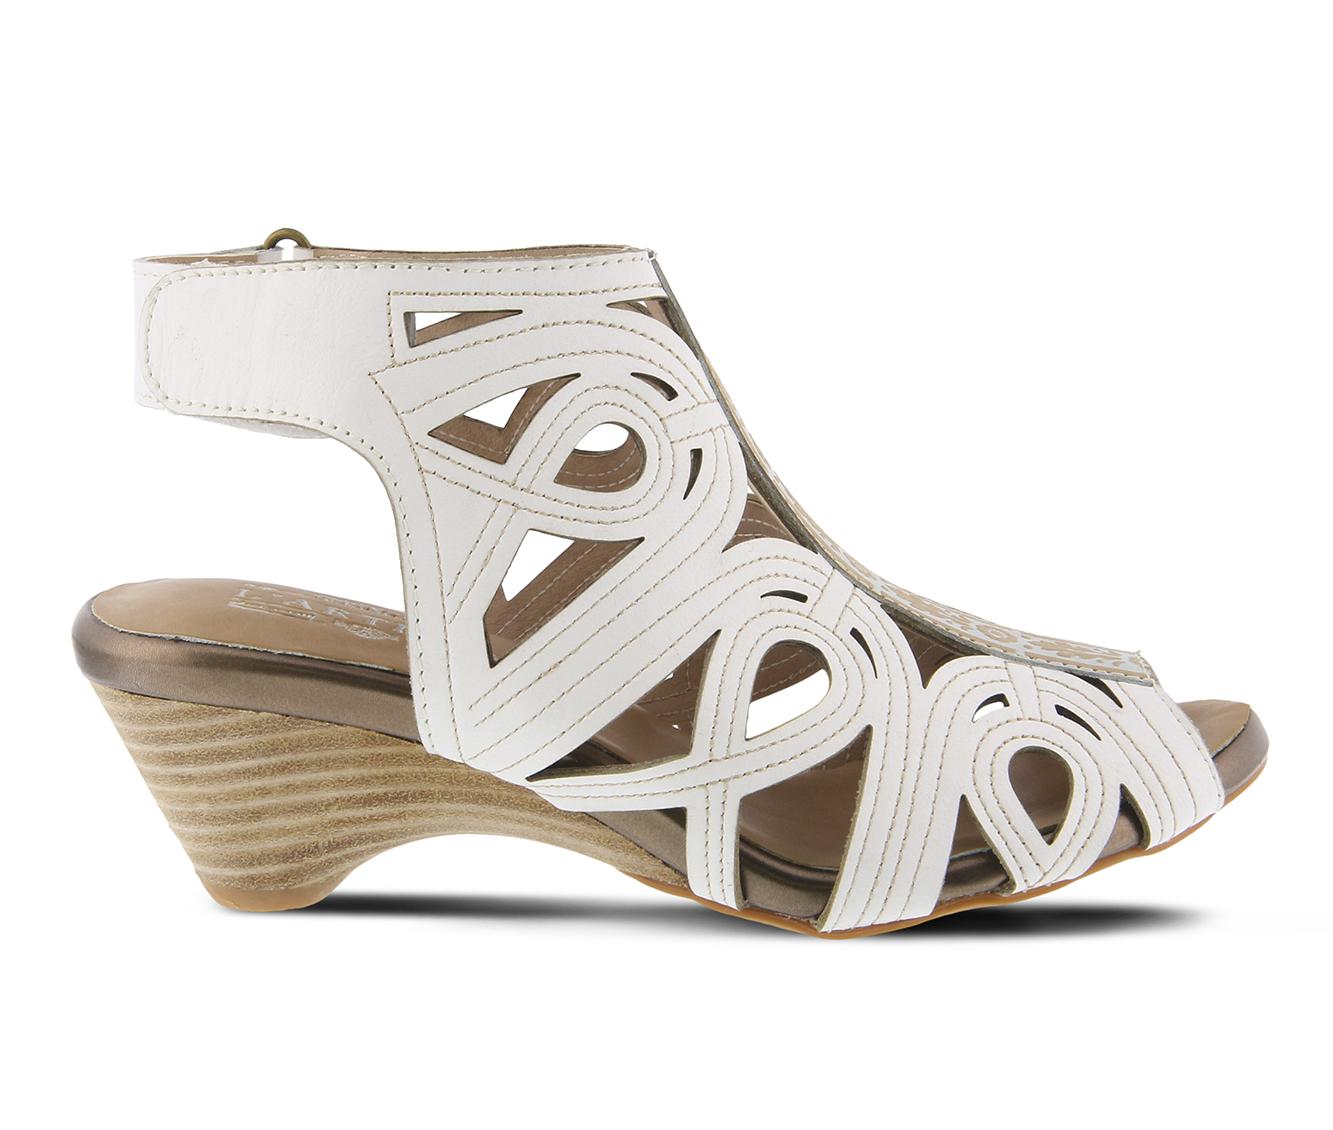 L'Artiste Flourish Women's Dress Shoe (White Leather)